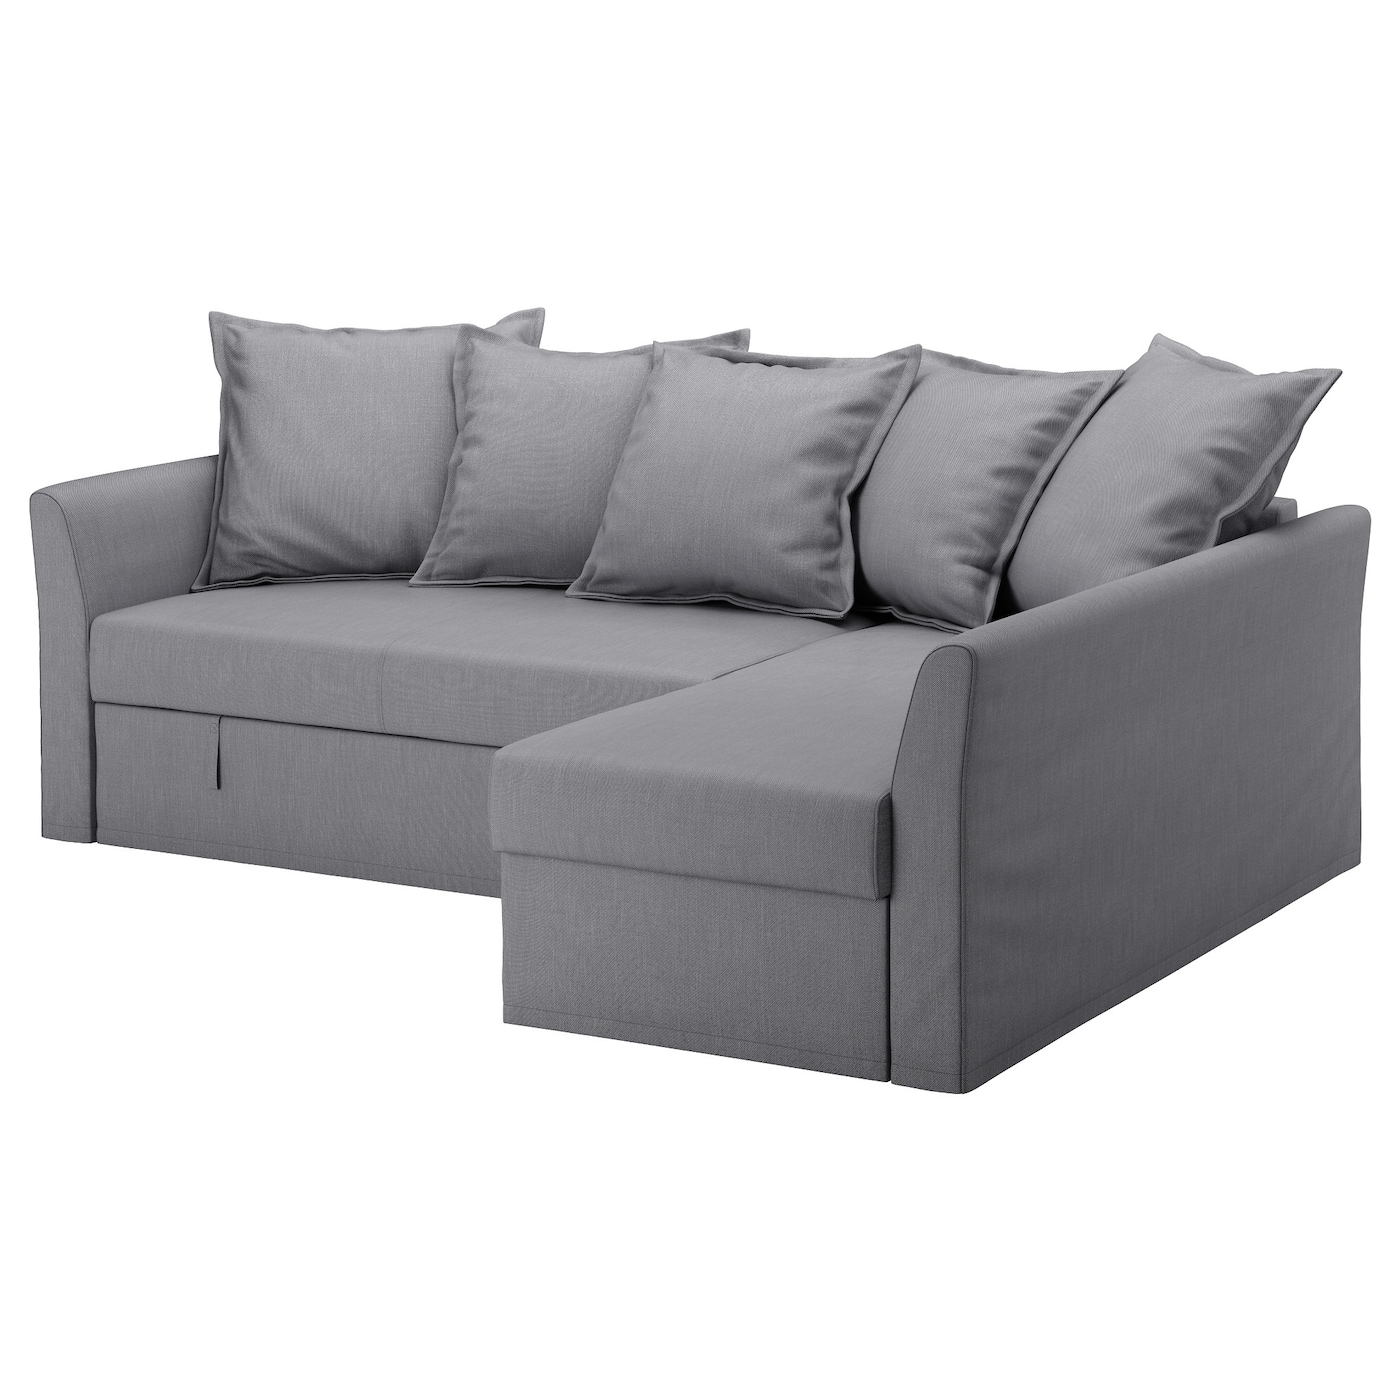 HOLMSUND Cover for corner sofa bed Nordvalla medium grey IKEA